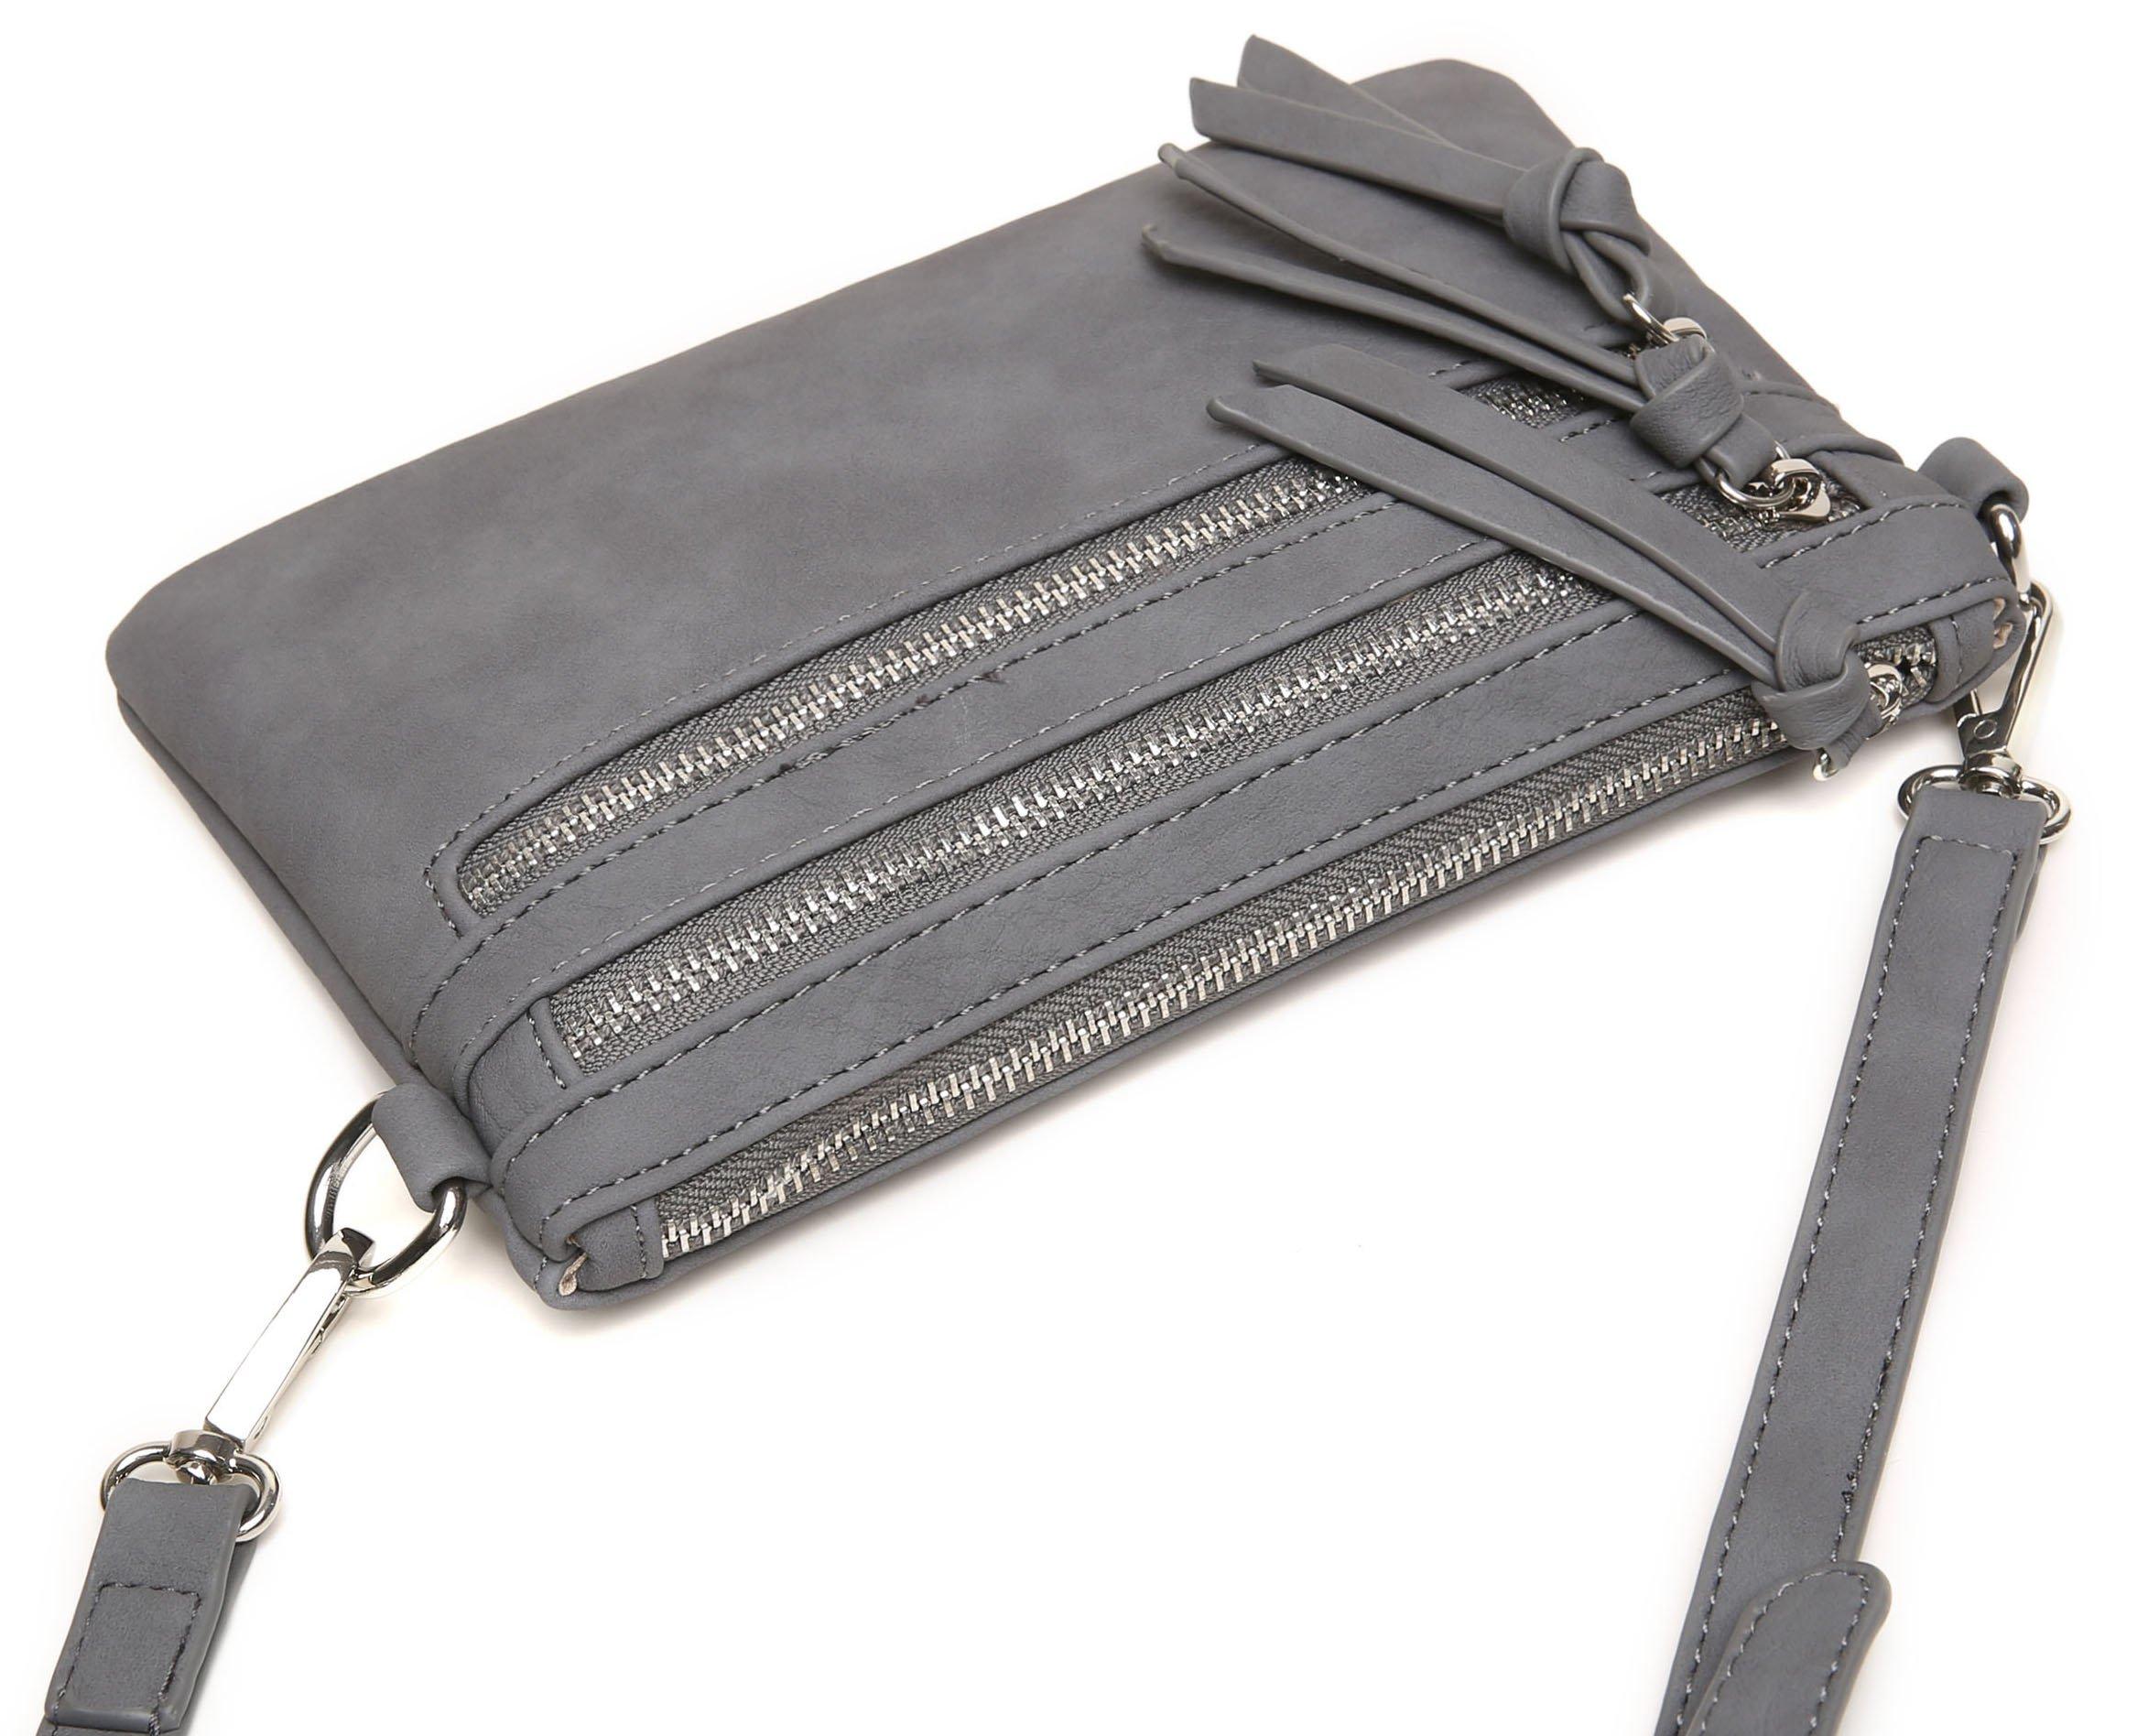 Aitbags Multi-Zipper Pocket Crossbody Handbag Lightweight Purse Functional Clutch with Wristlet by Aitbags (Image #4)